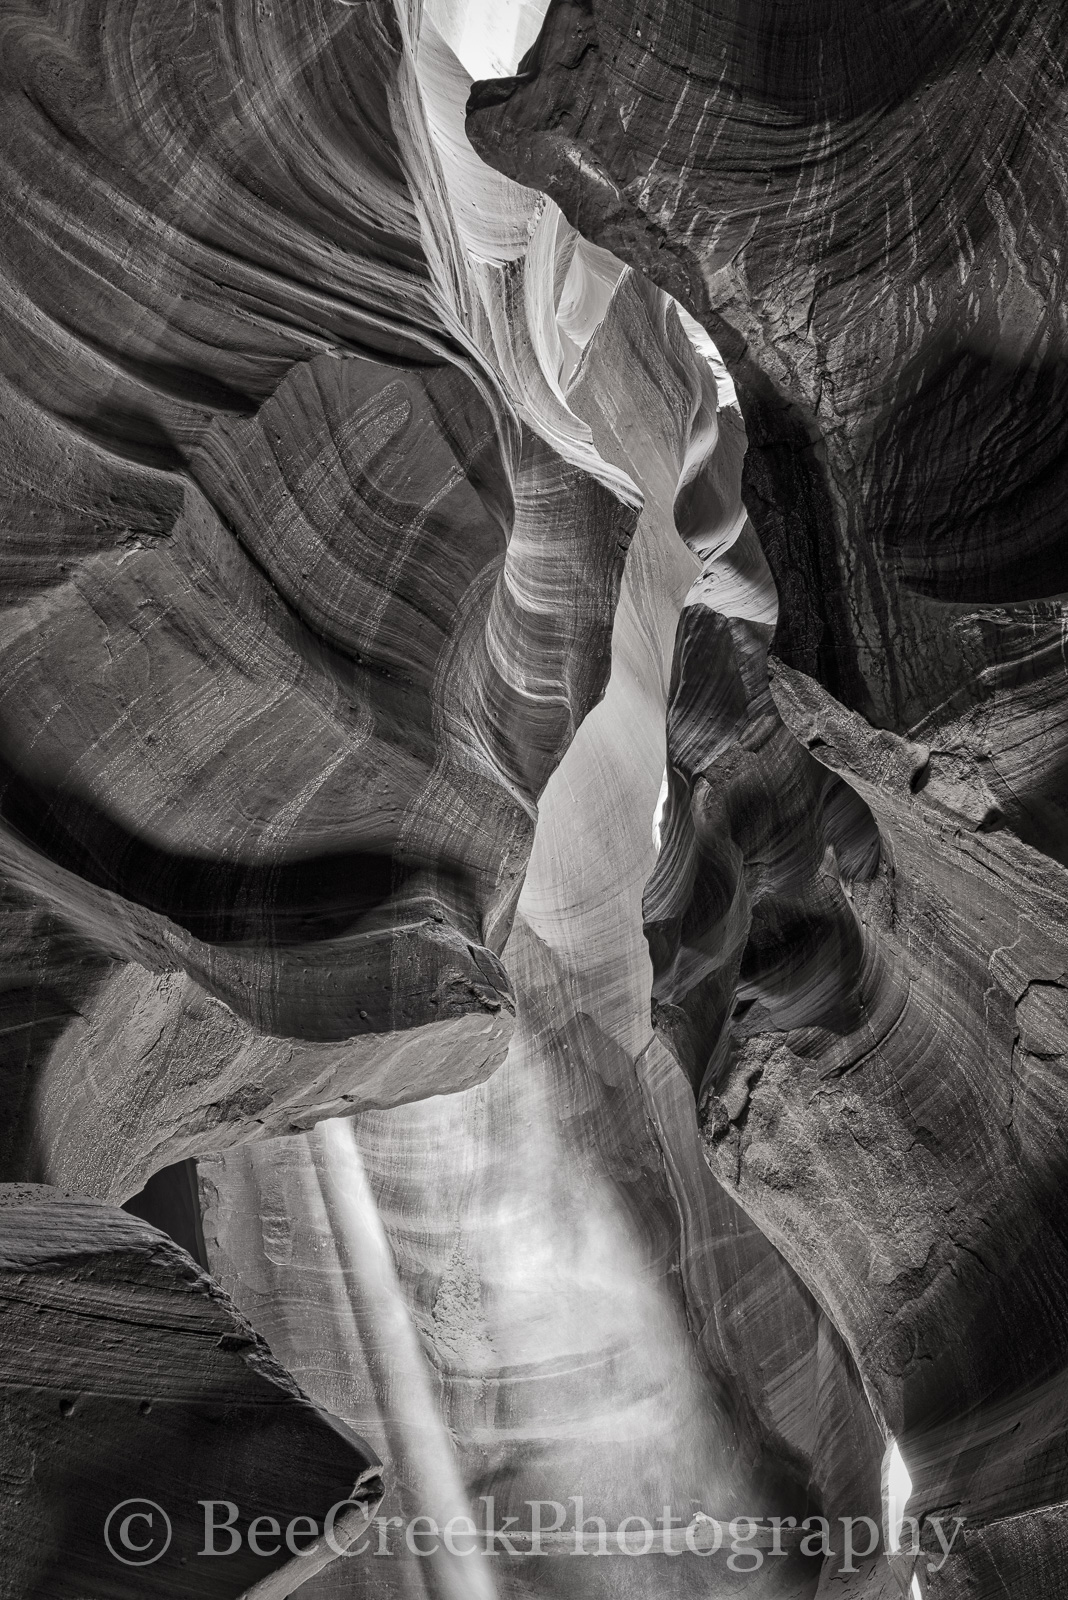 AZ, Arizona, Fine art photos, Page AZ, Peter lik, antelope canyons, antelope canyons az, best photos, best seller, black and white, bw, canyons, desert southwest, images of antelope canyon, images of , photo